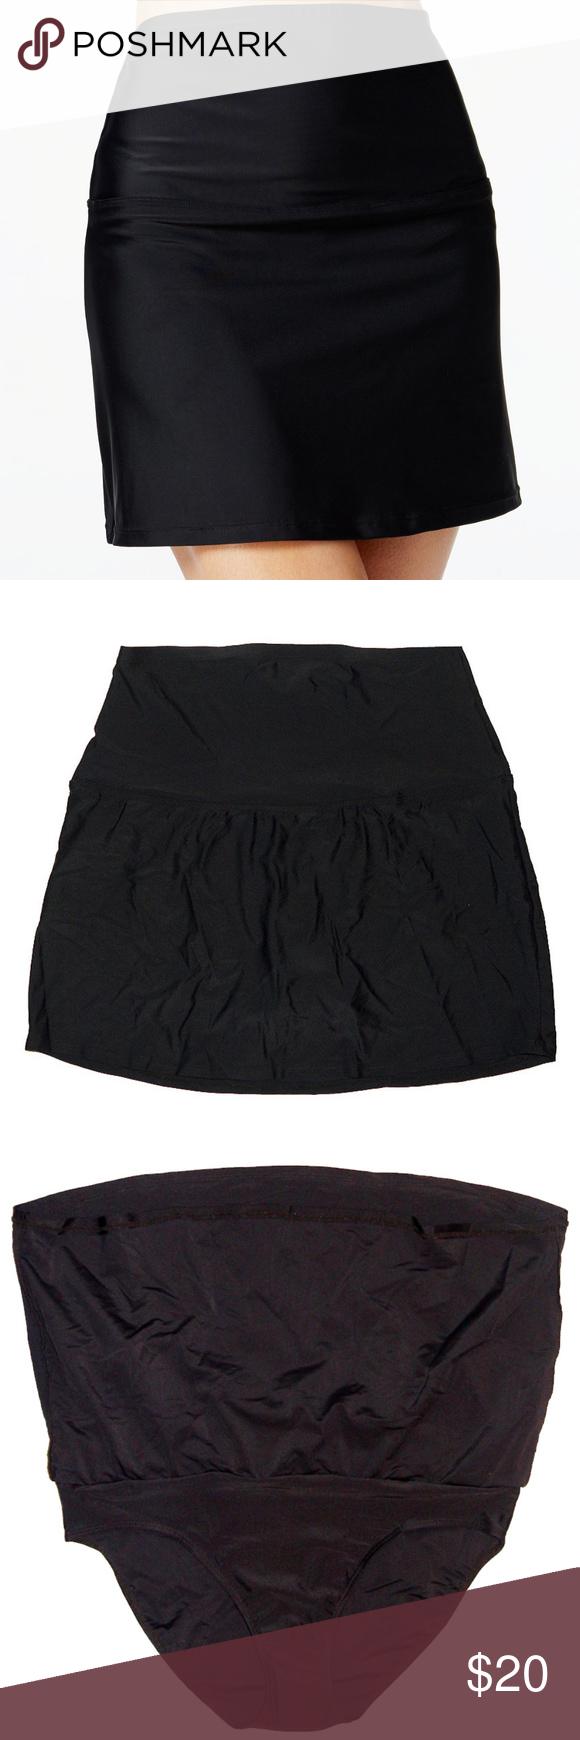 a30f63992f Island Escape High Waist Skirted Bottom Swim Skirt Island Escape La Palma  High-Waisted Tummy